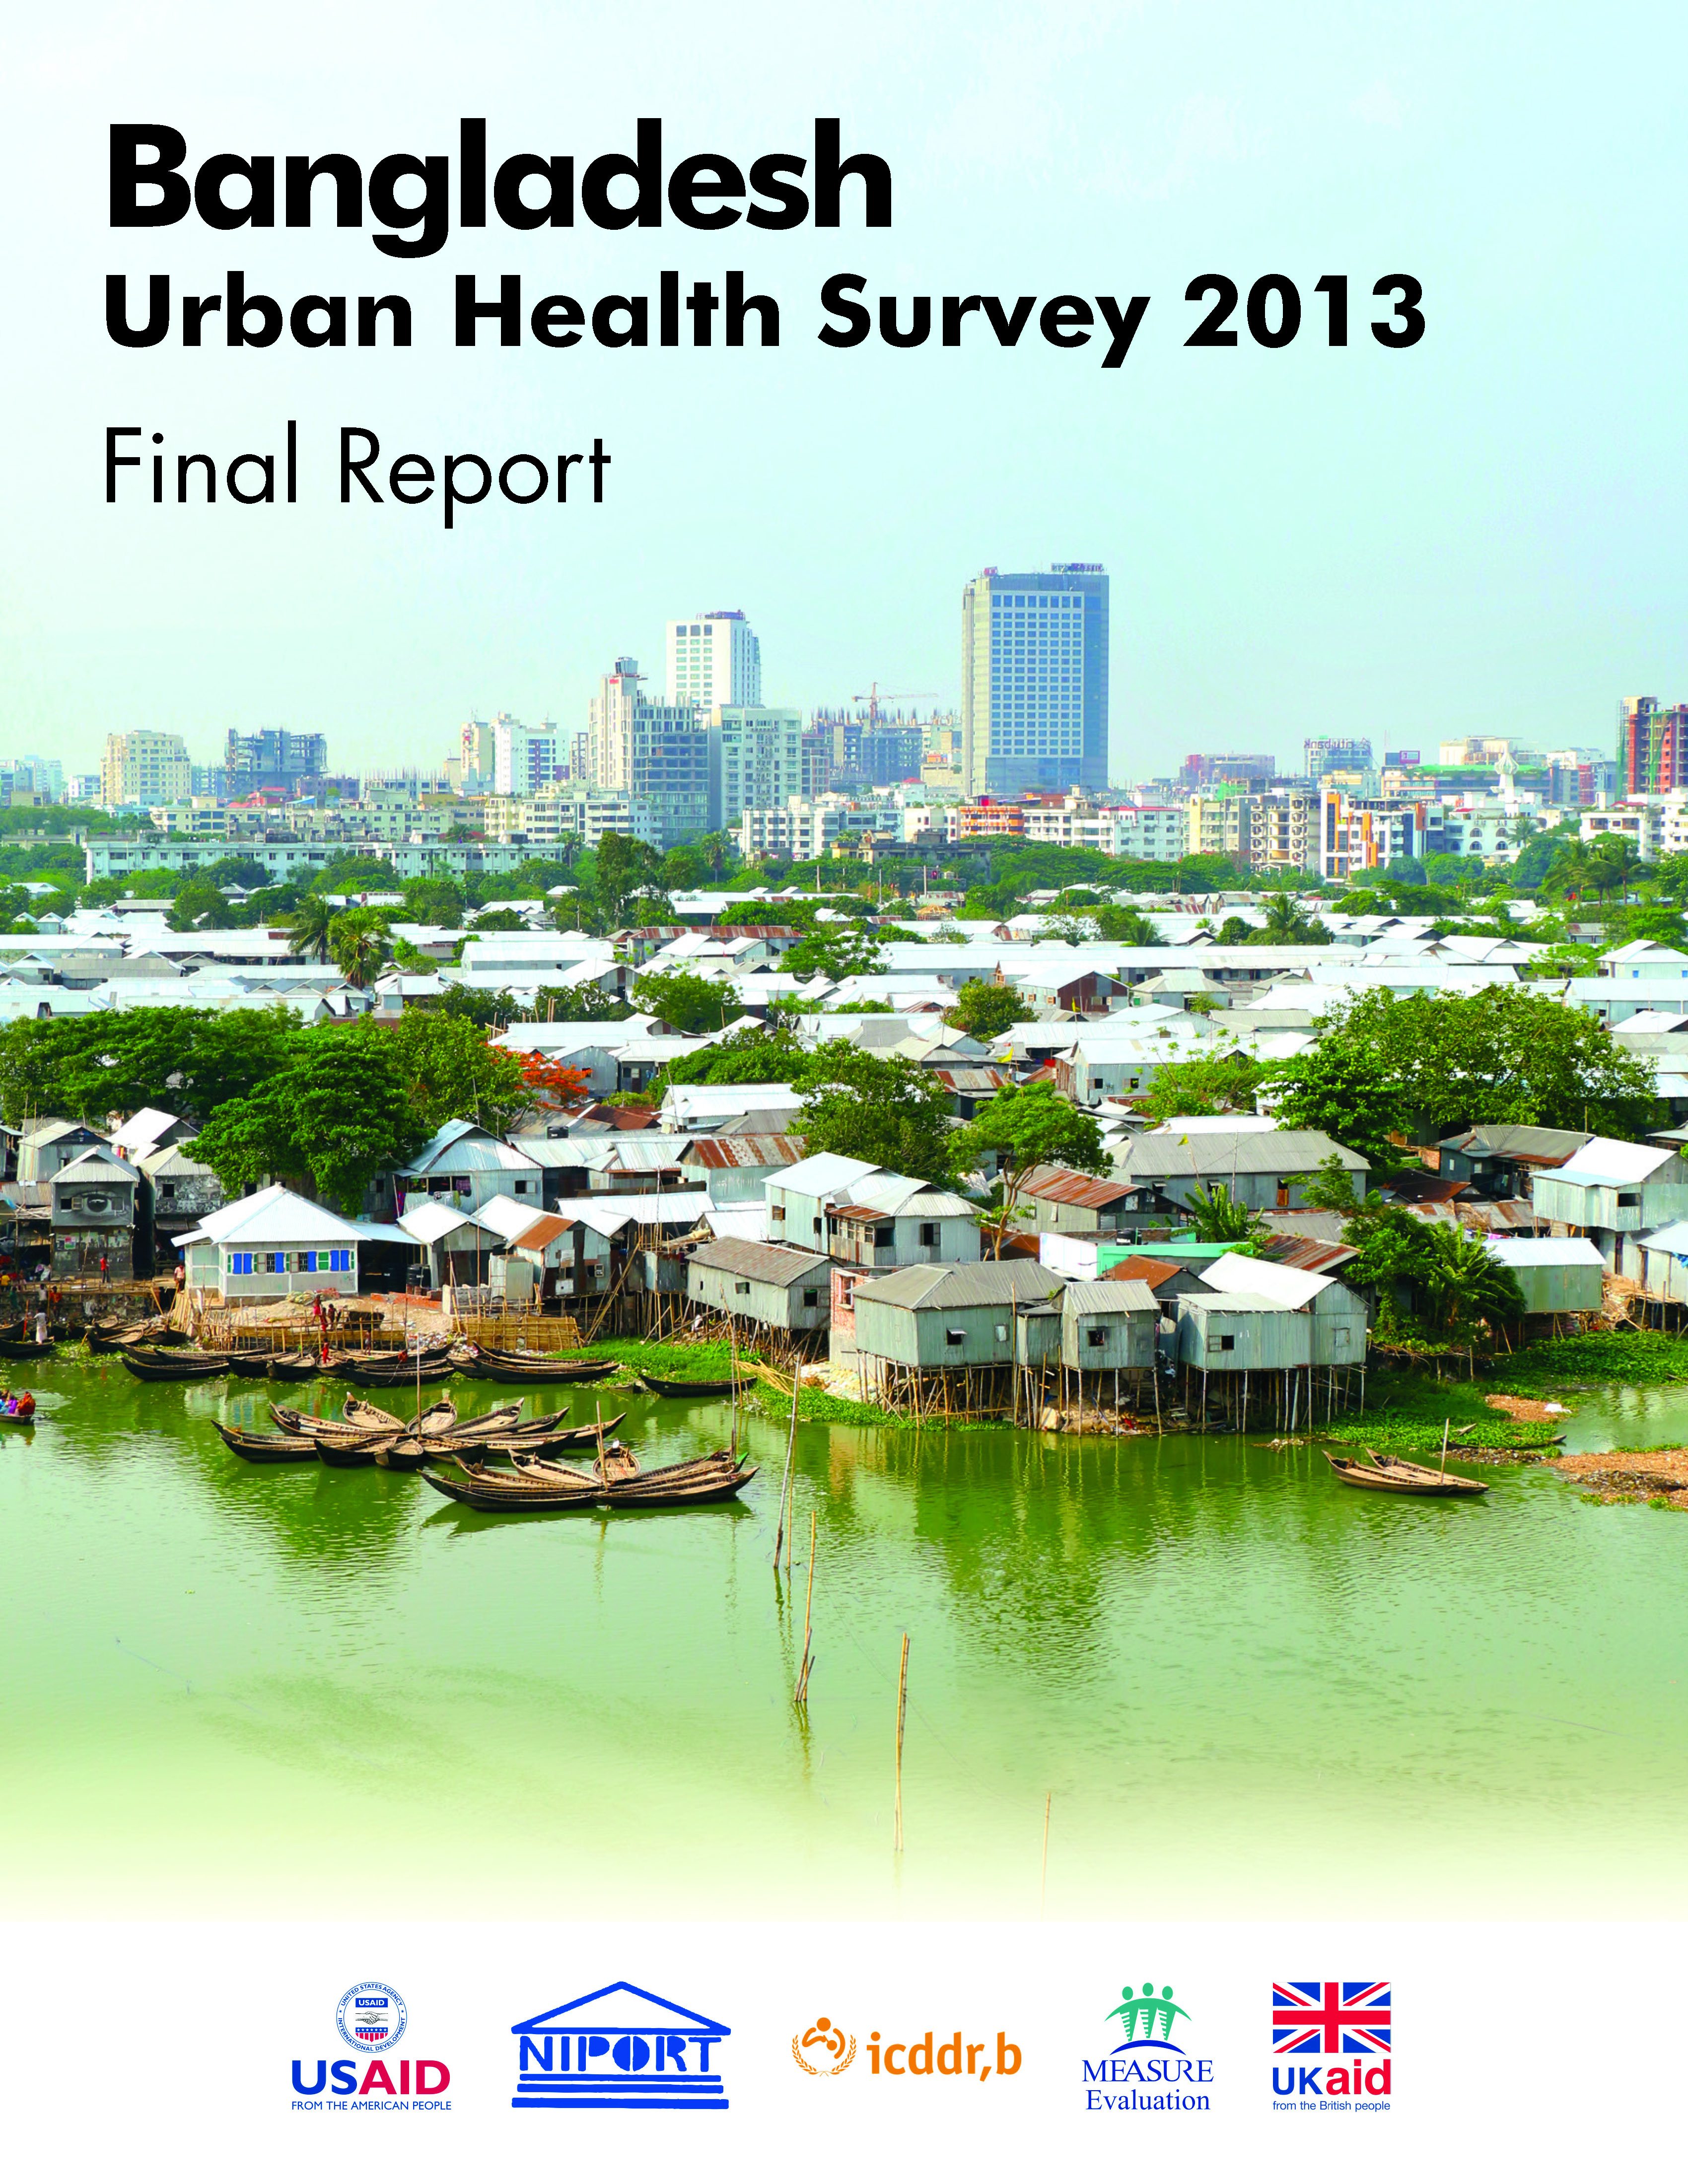 Bangladesh Urban Health Survey 2013 Final Report